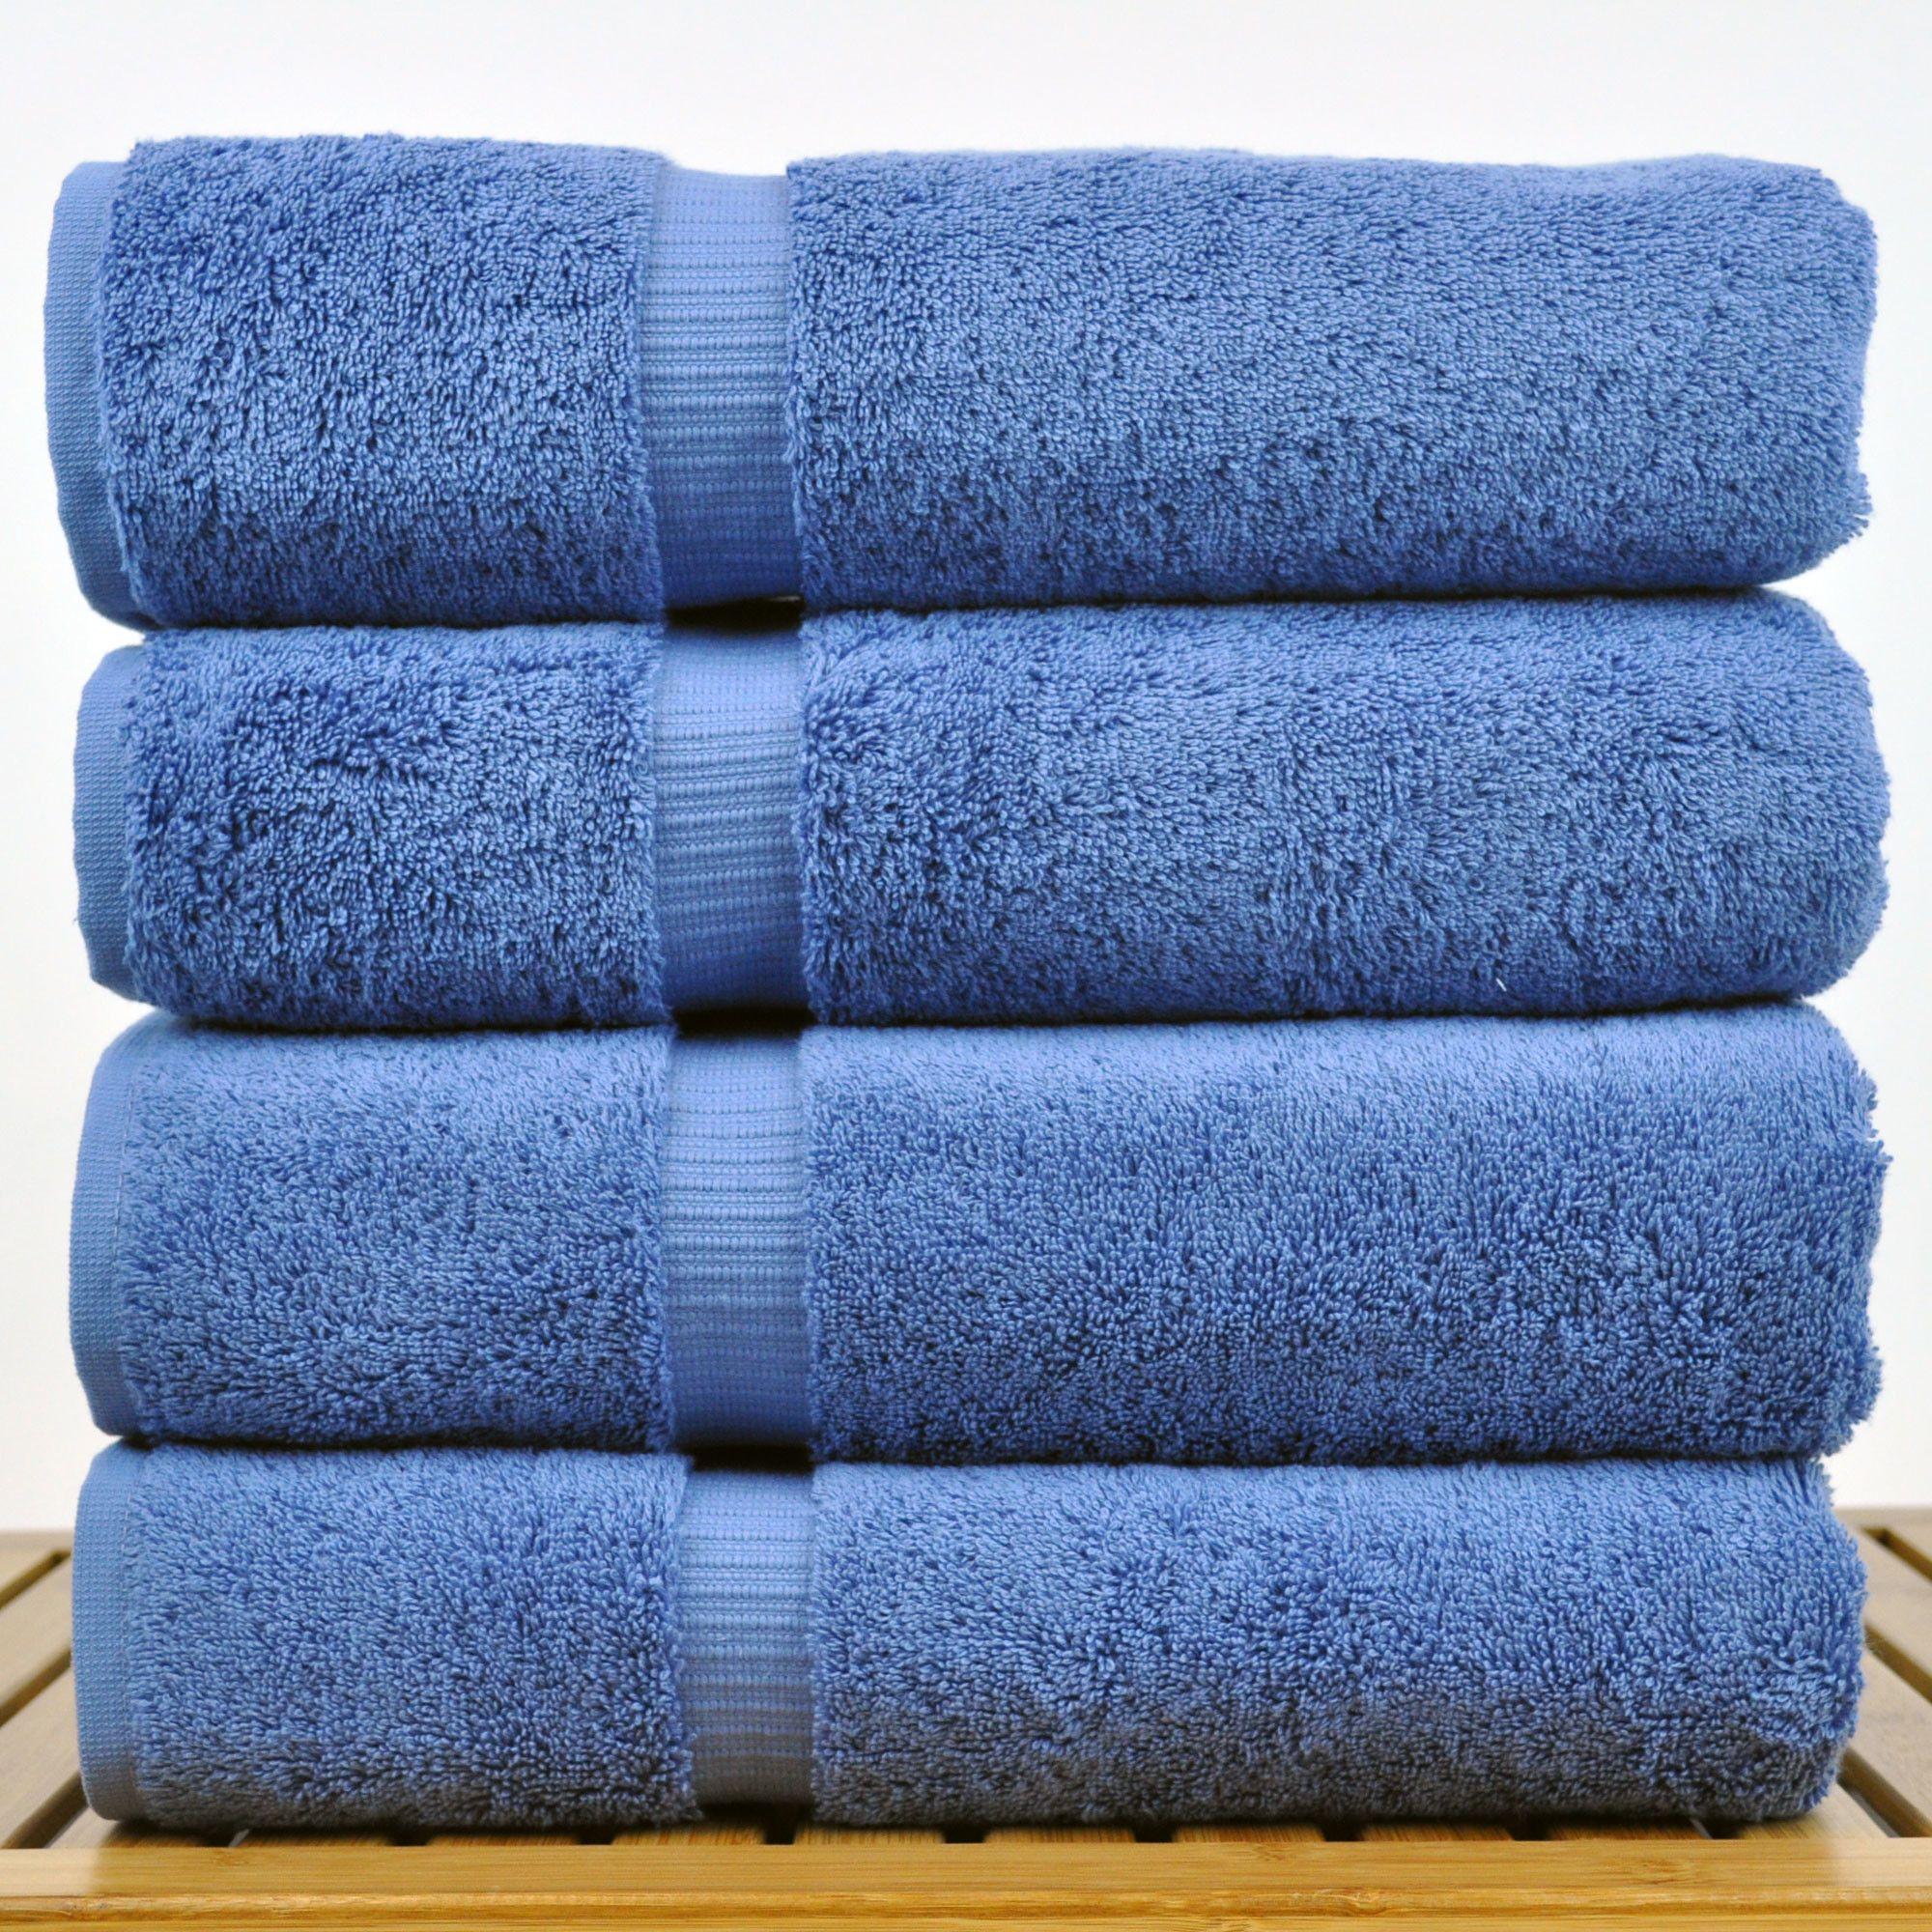 Luxury Hotel And Spa Towel 100 Turkish Cotton Bath Towel